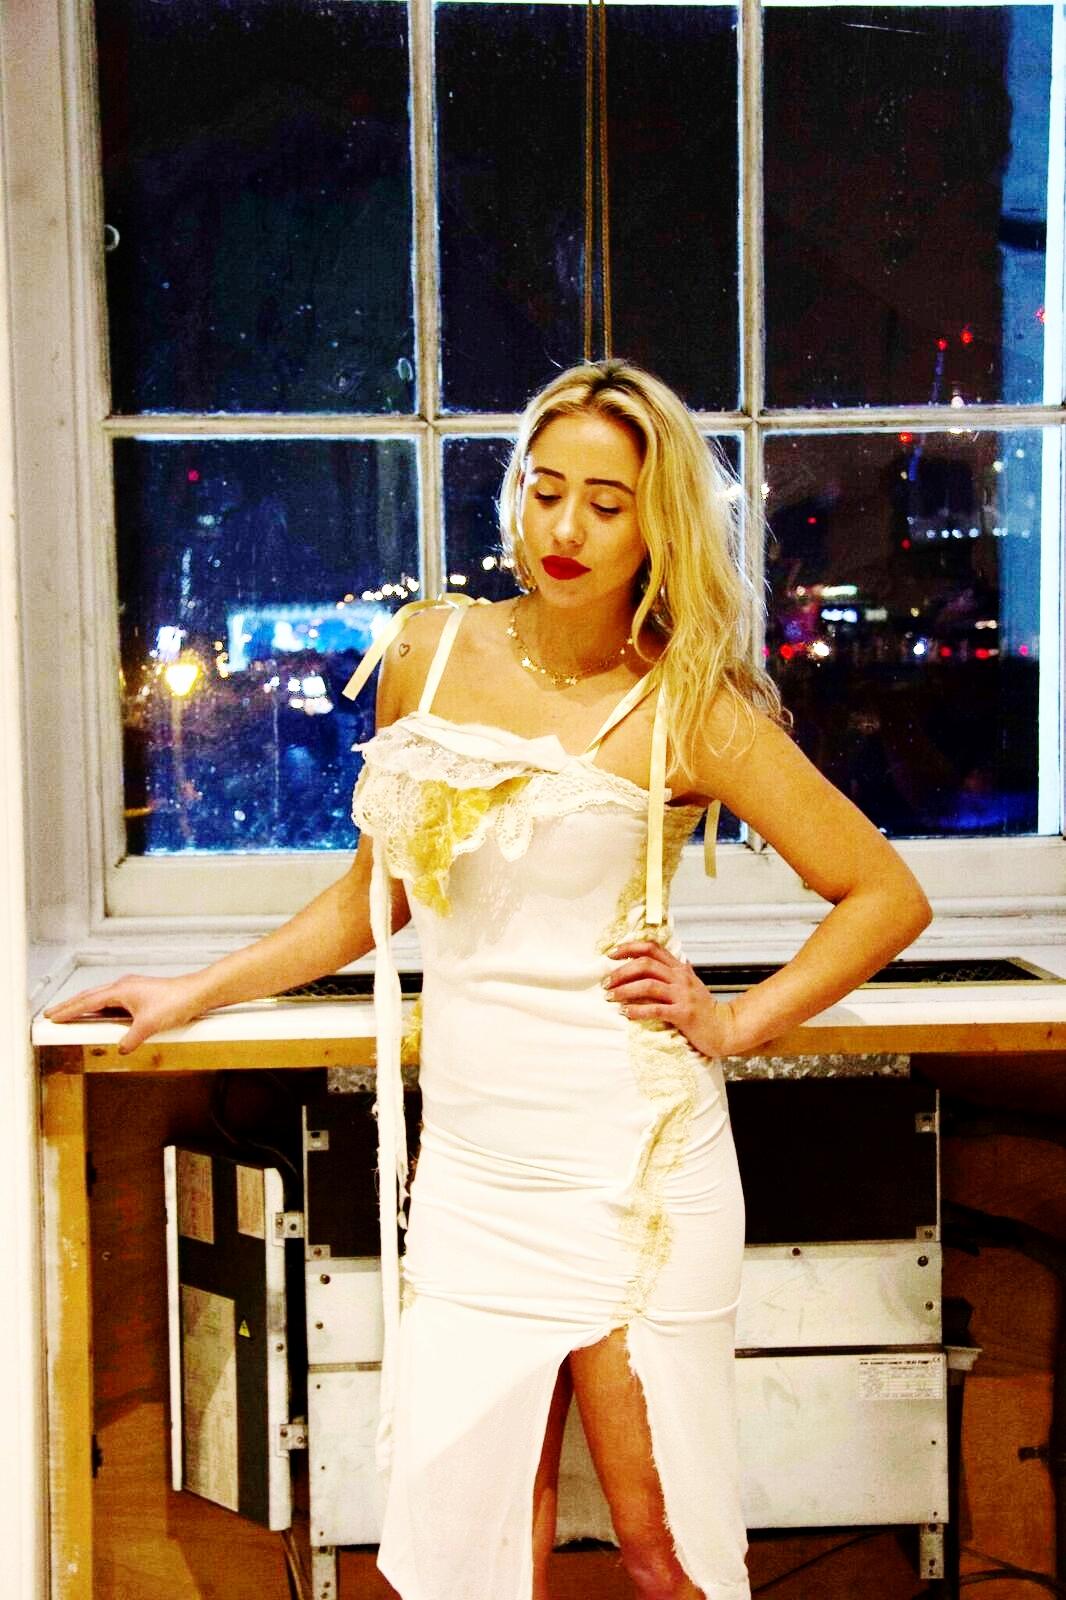 The Golden Goddess Dress - Limited Edition